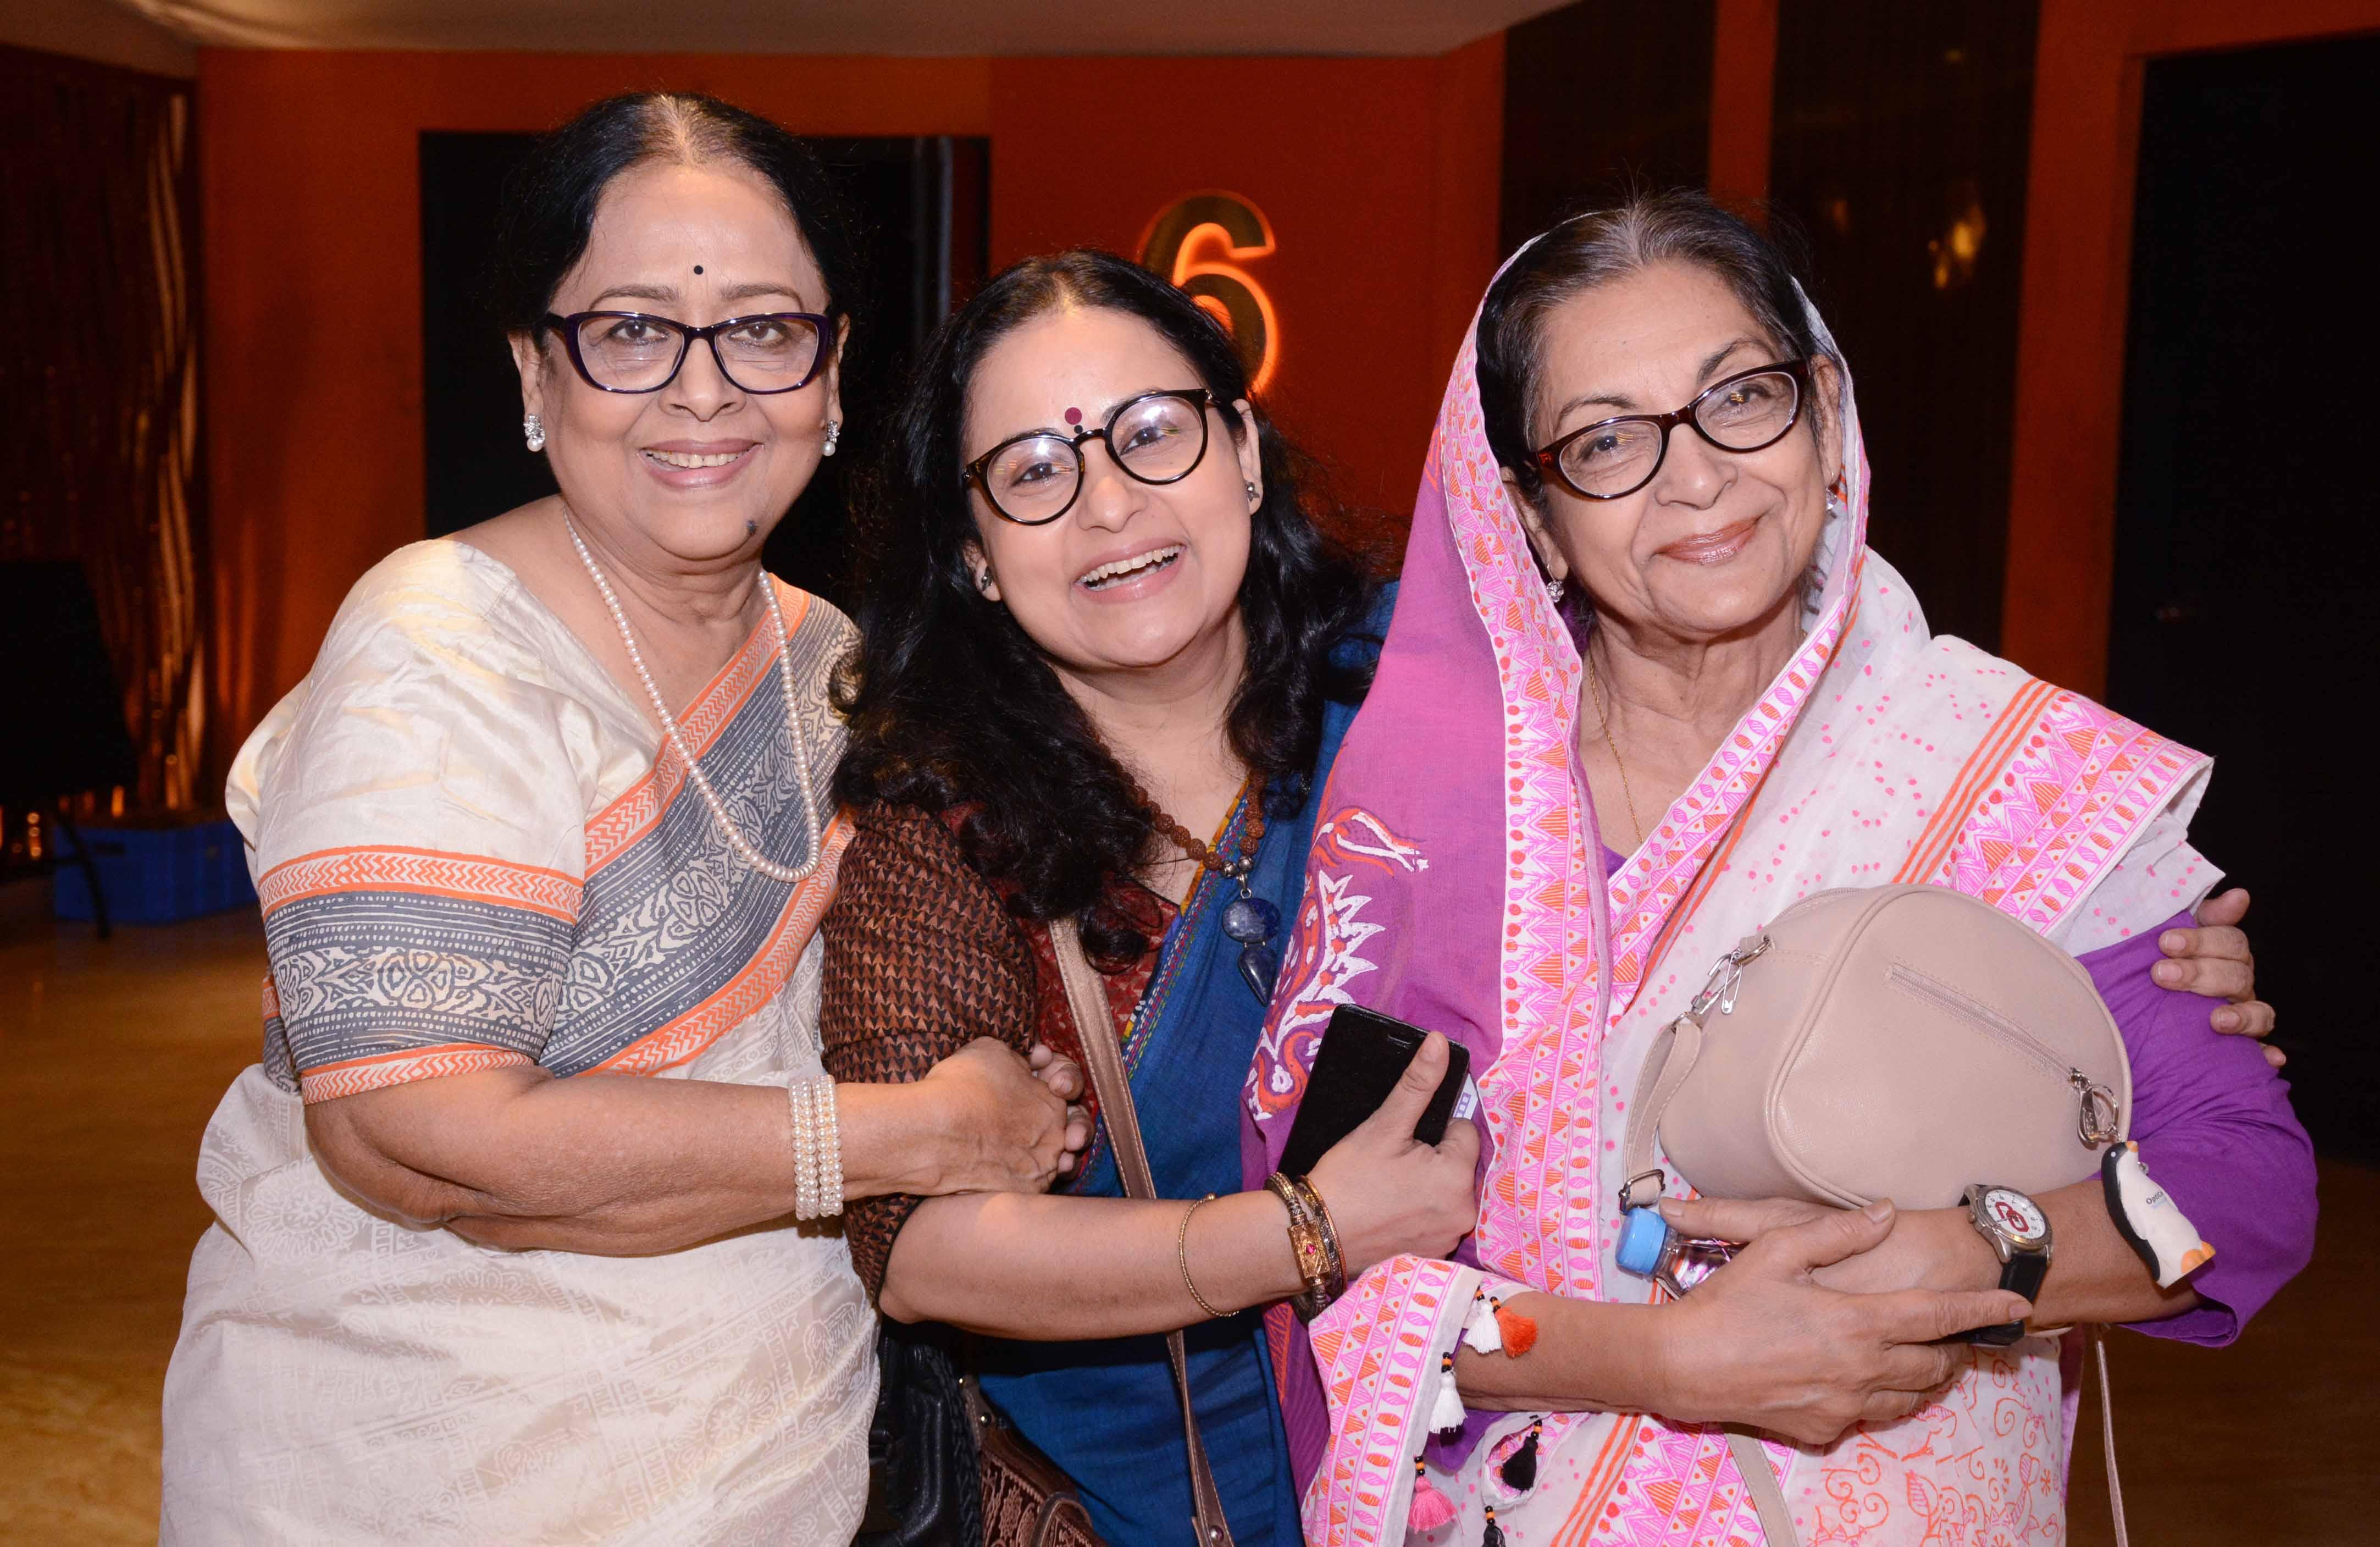 Sharmily, Mimi, Dilara in a frame